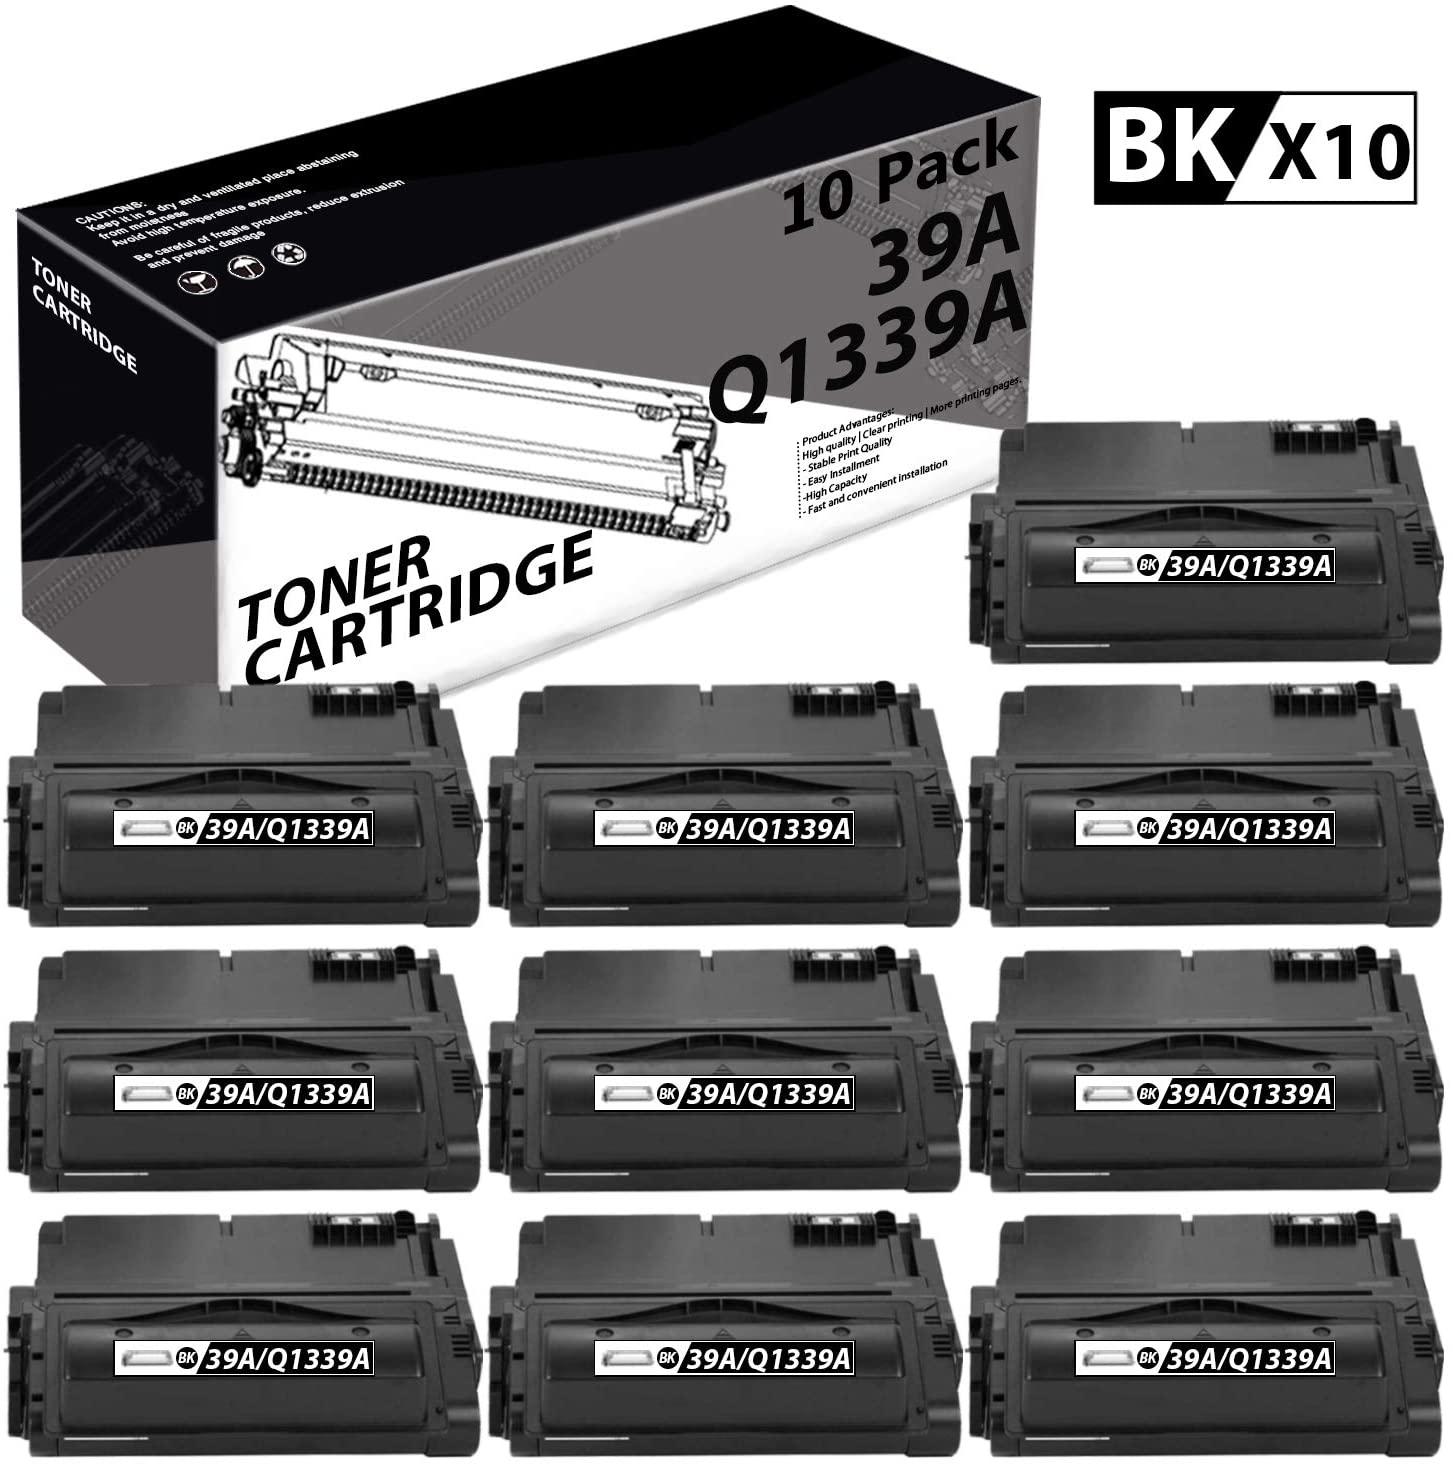 39A | Q1339A(10 Pack-Black) Compatible Toner Cartridge Replacement for HP Laserjet 4300 4300n 4200 4200N 4250 4250n 4350 4350n M4345xs M4345 MFP Laser Printers.